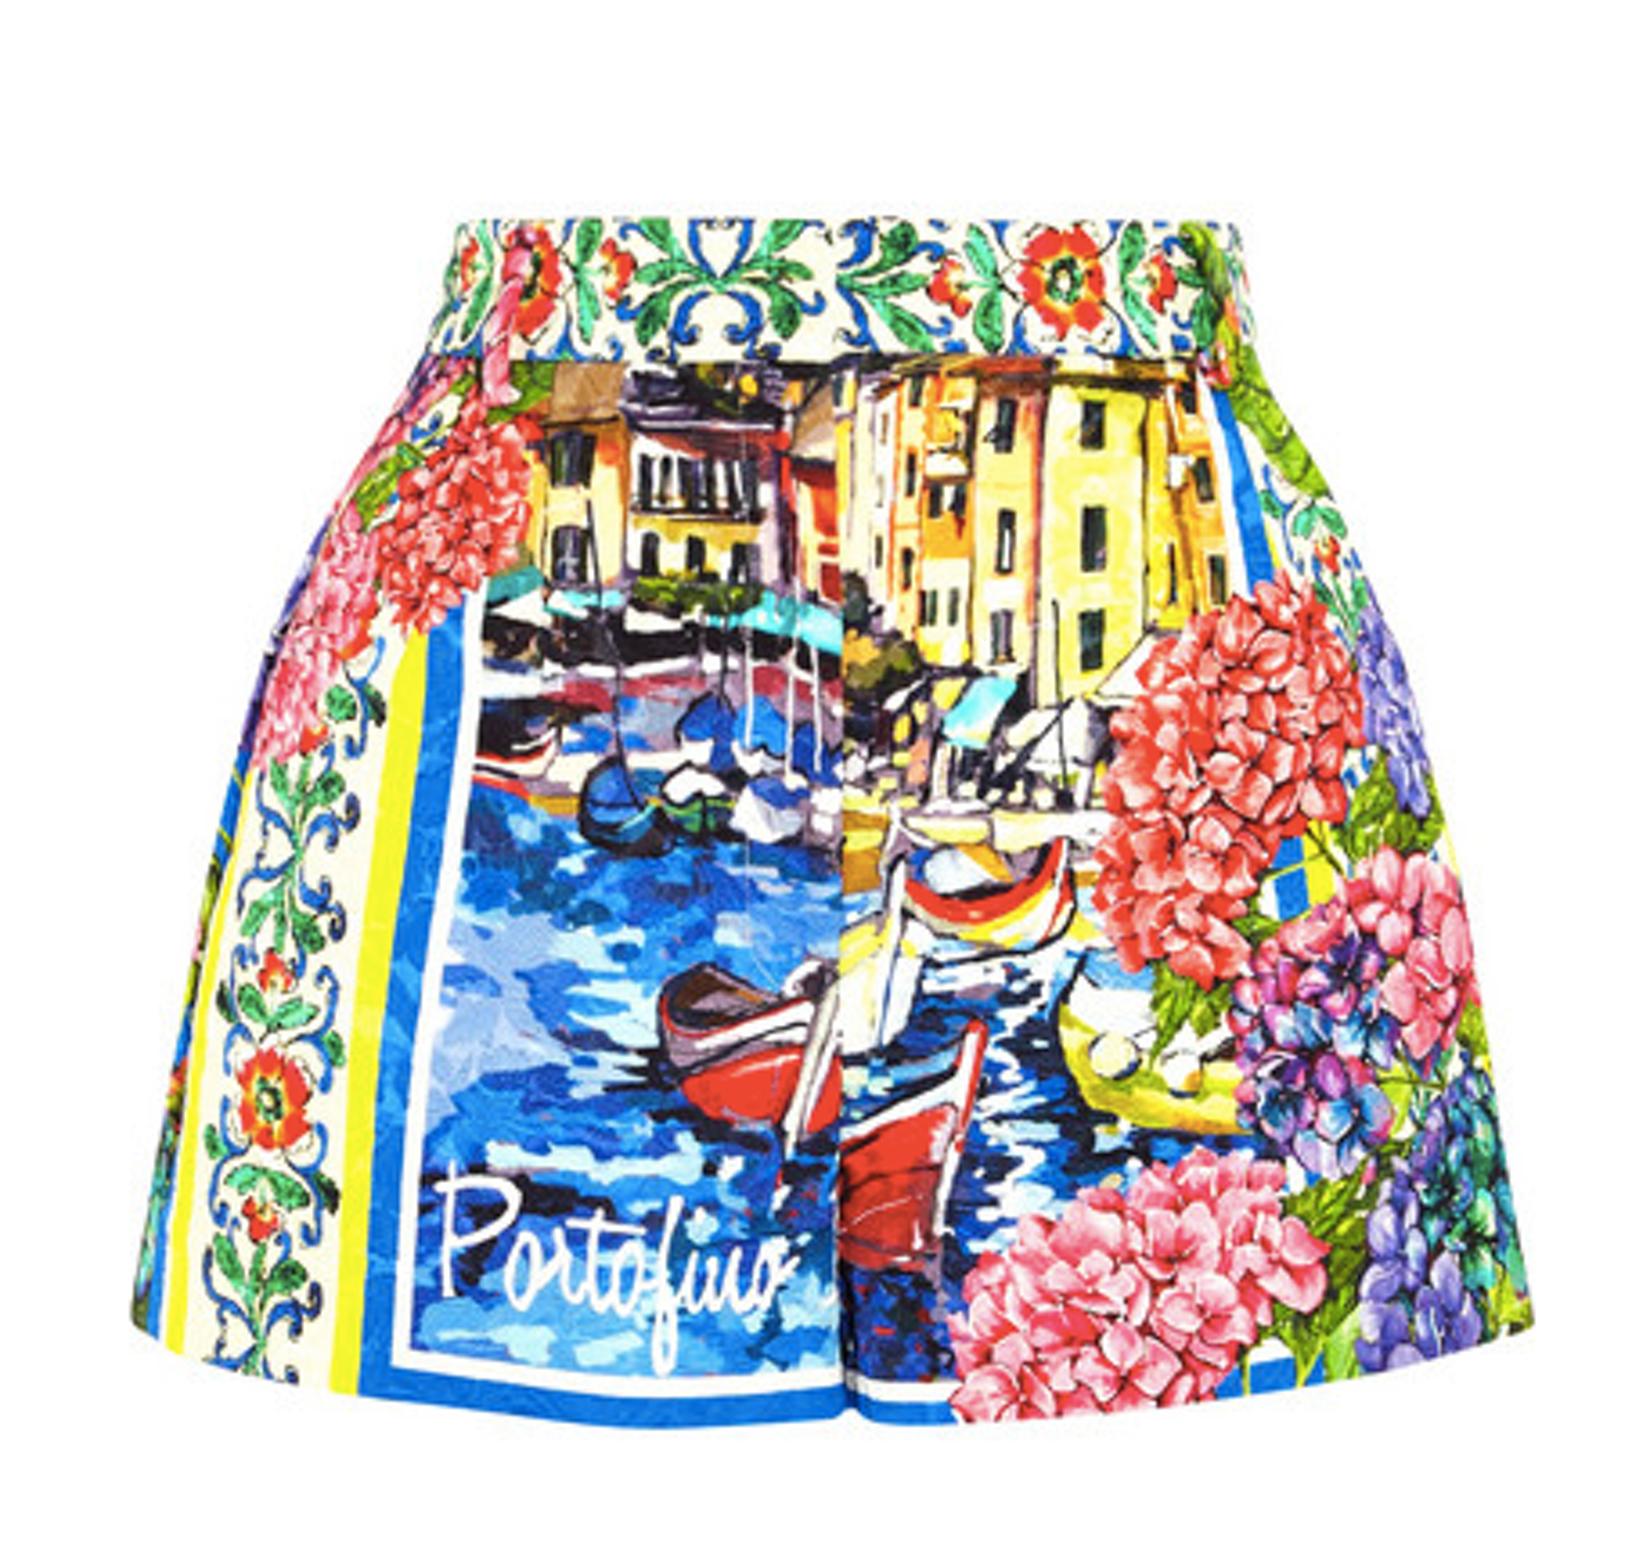 Portofino printed brocade shorts n from Dolce & Gabbana | PS Dept.